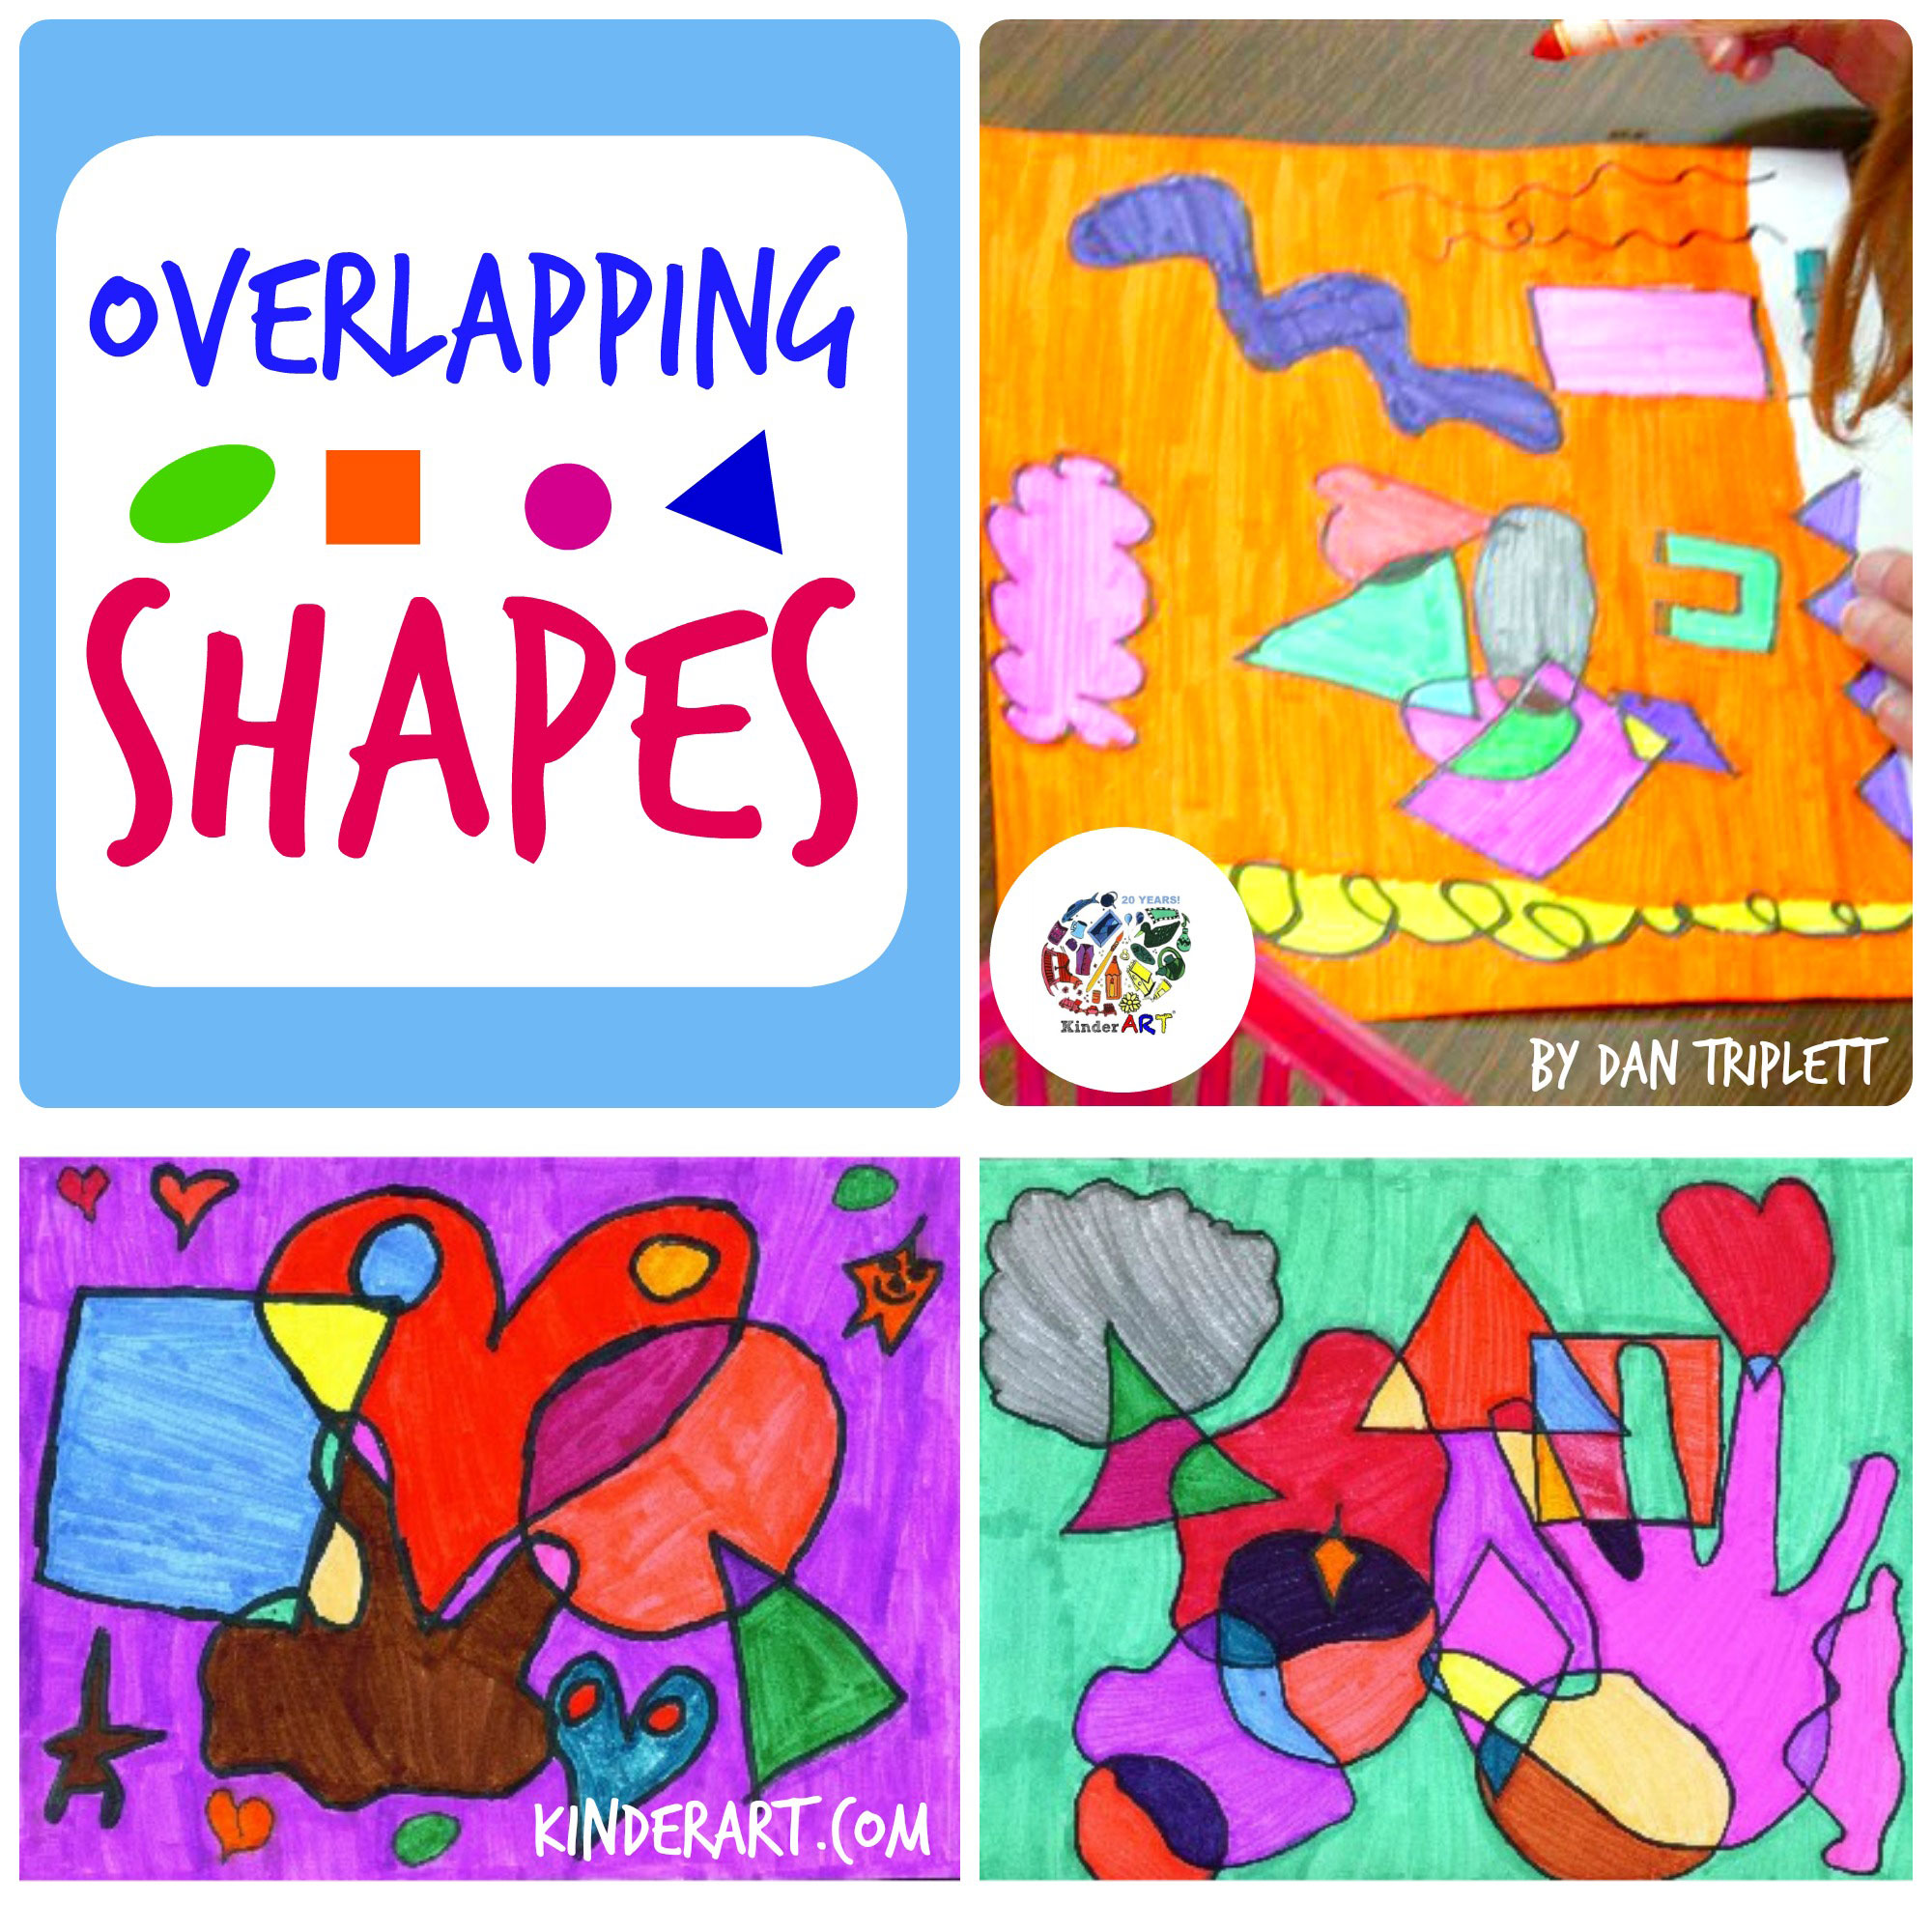 Overlapping Shapes Art Lesson Plan KinderArt.com